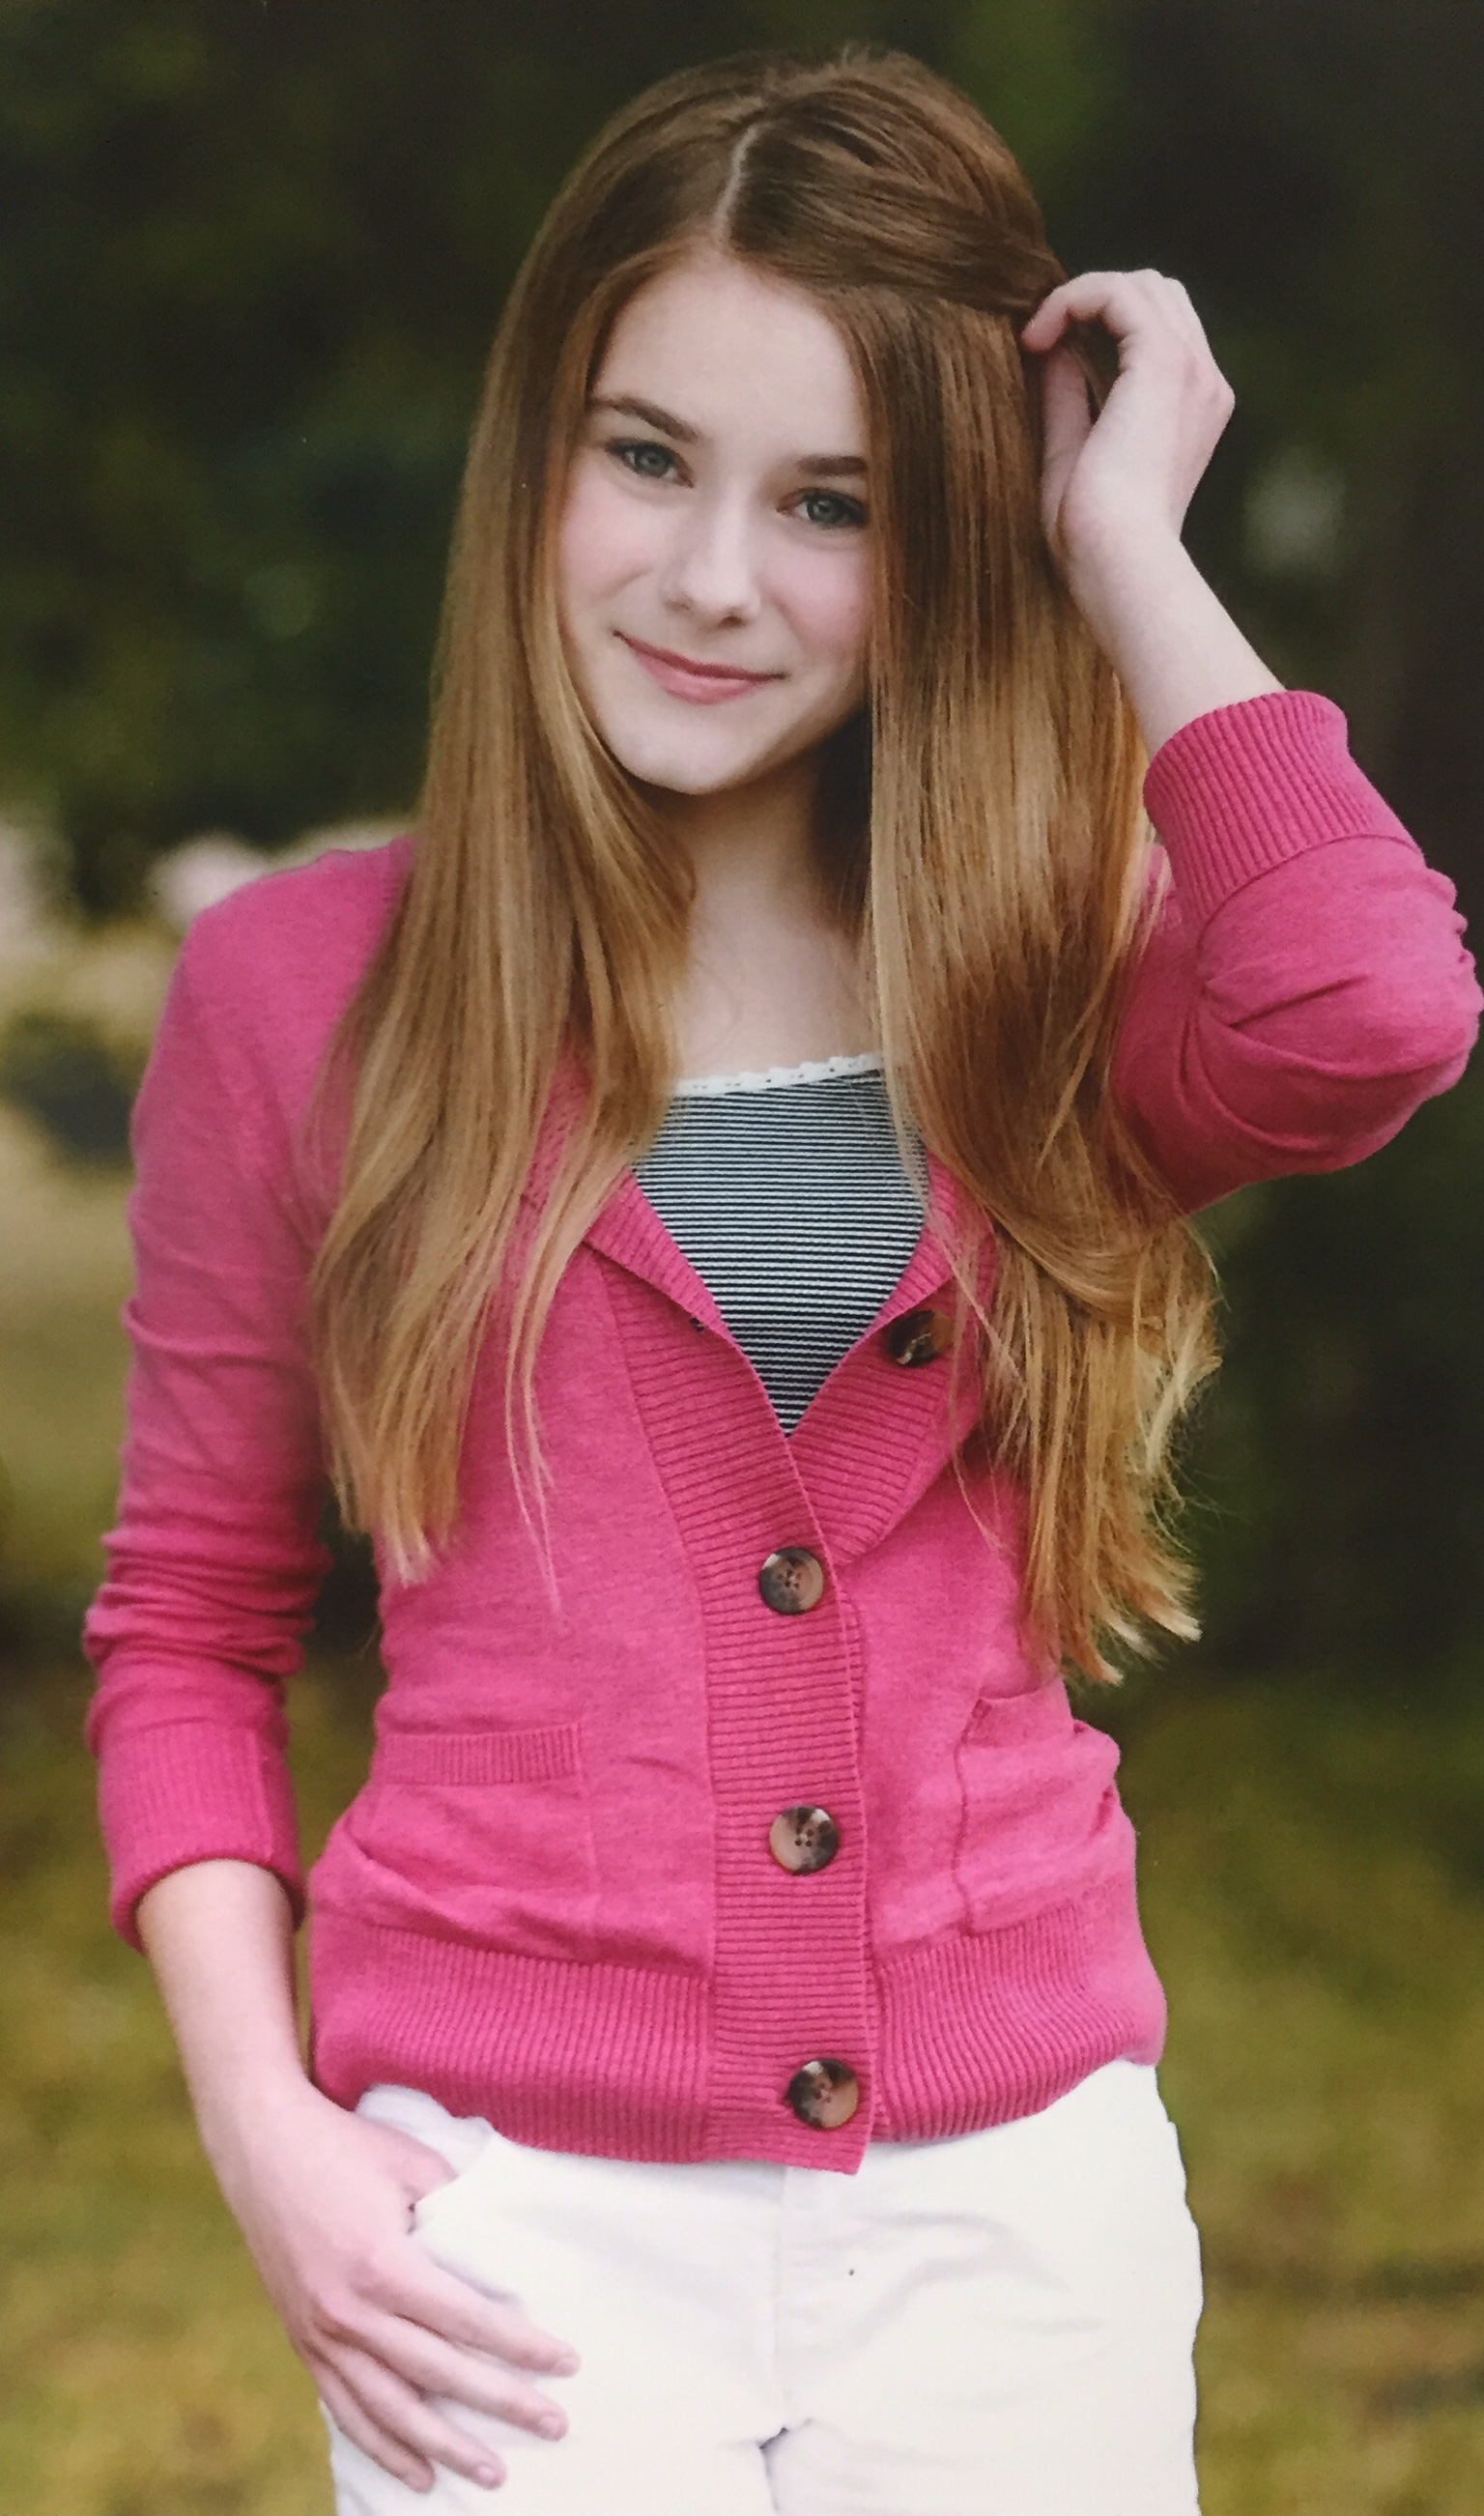 Claire Riffle